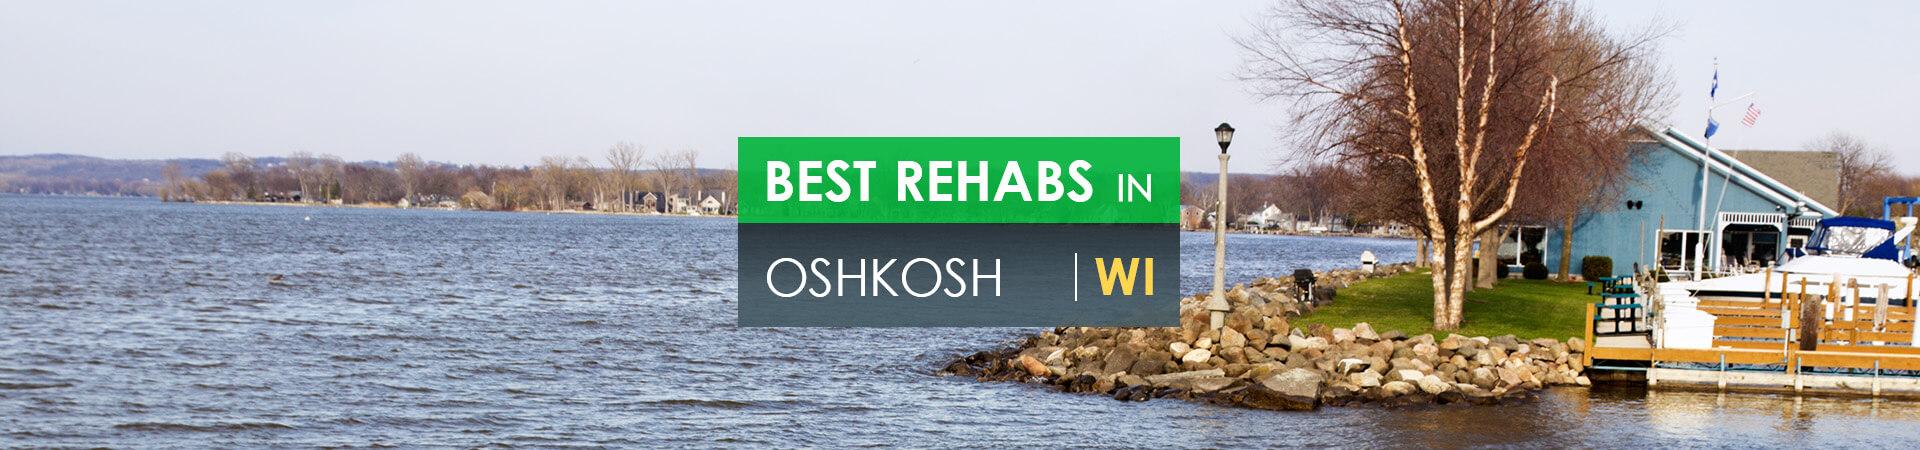 Best rehabs in Oshkosh, WI